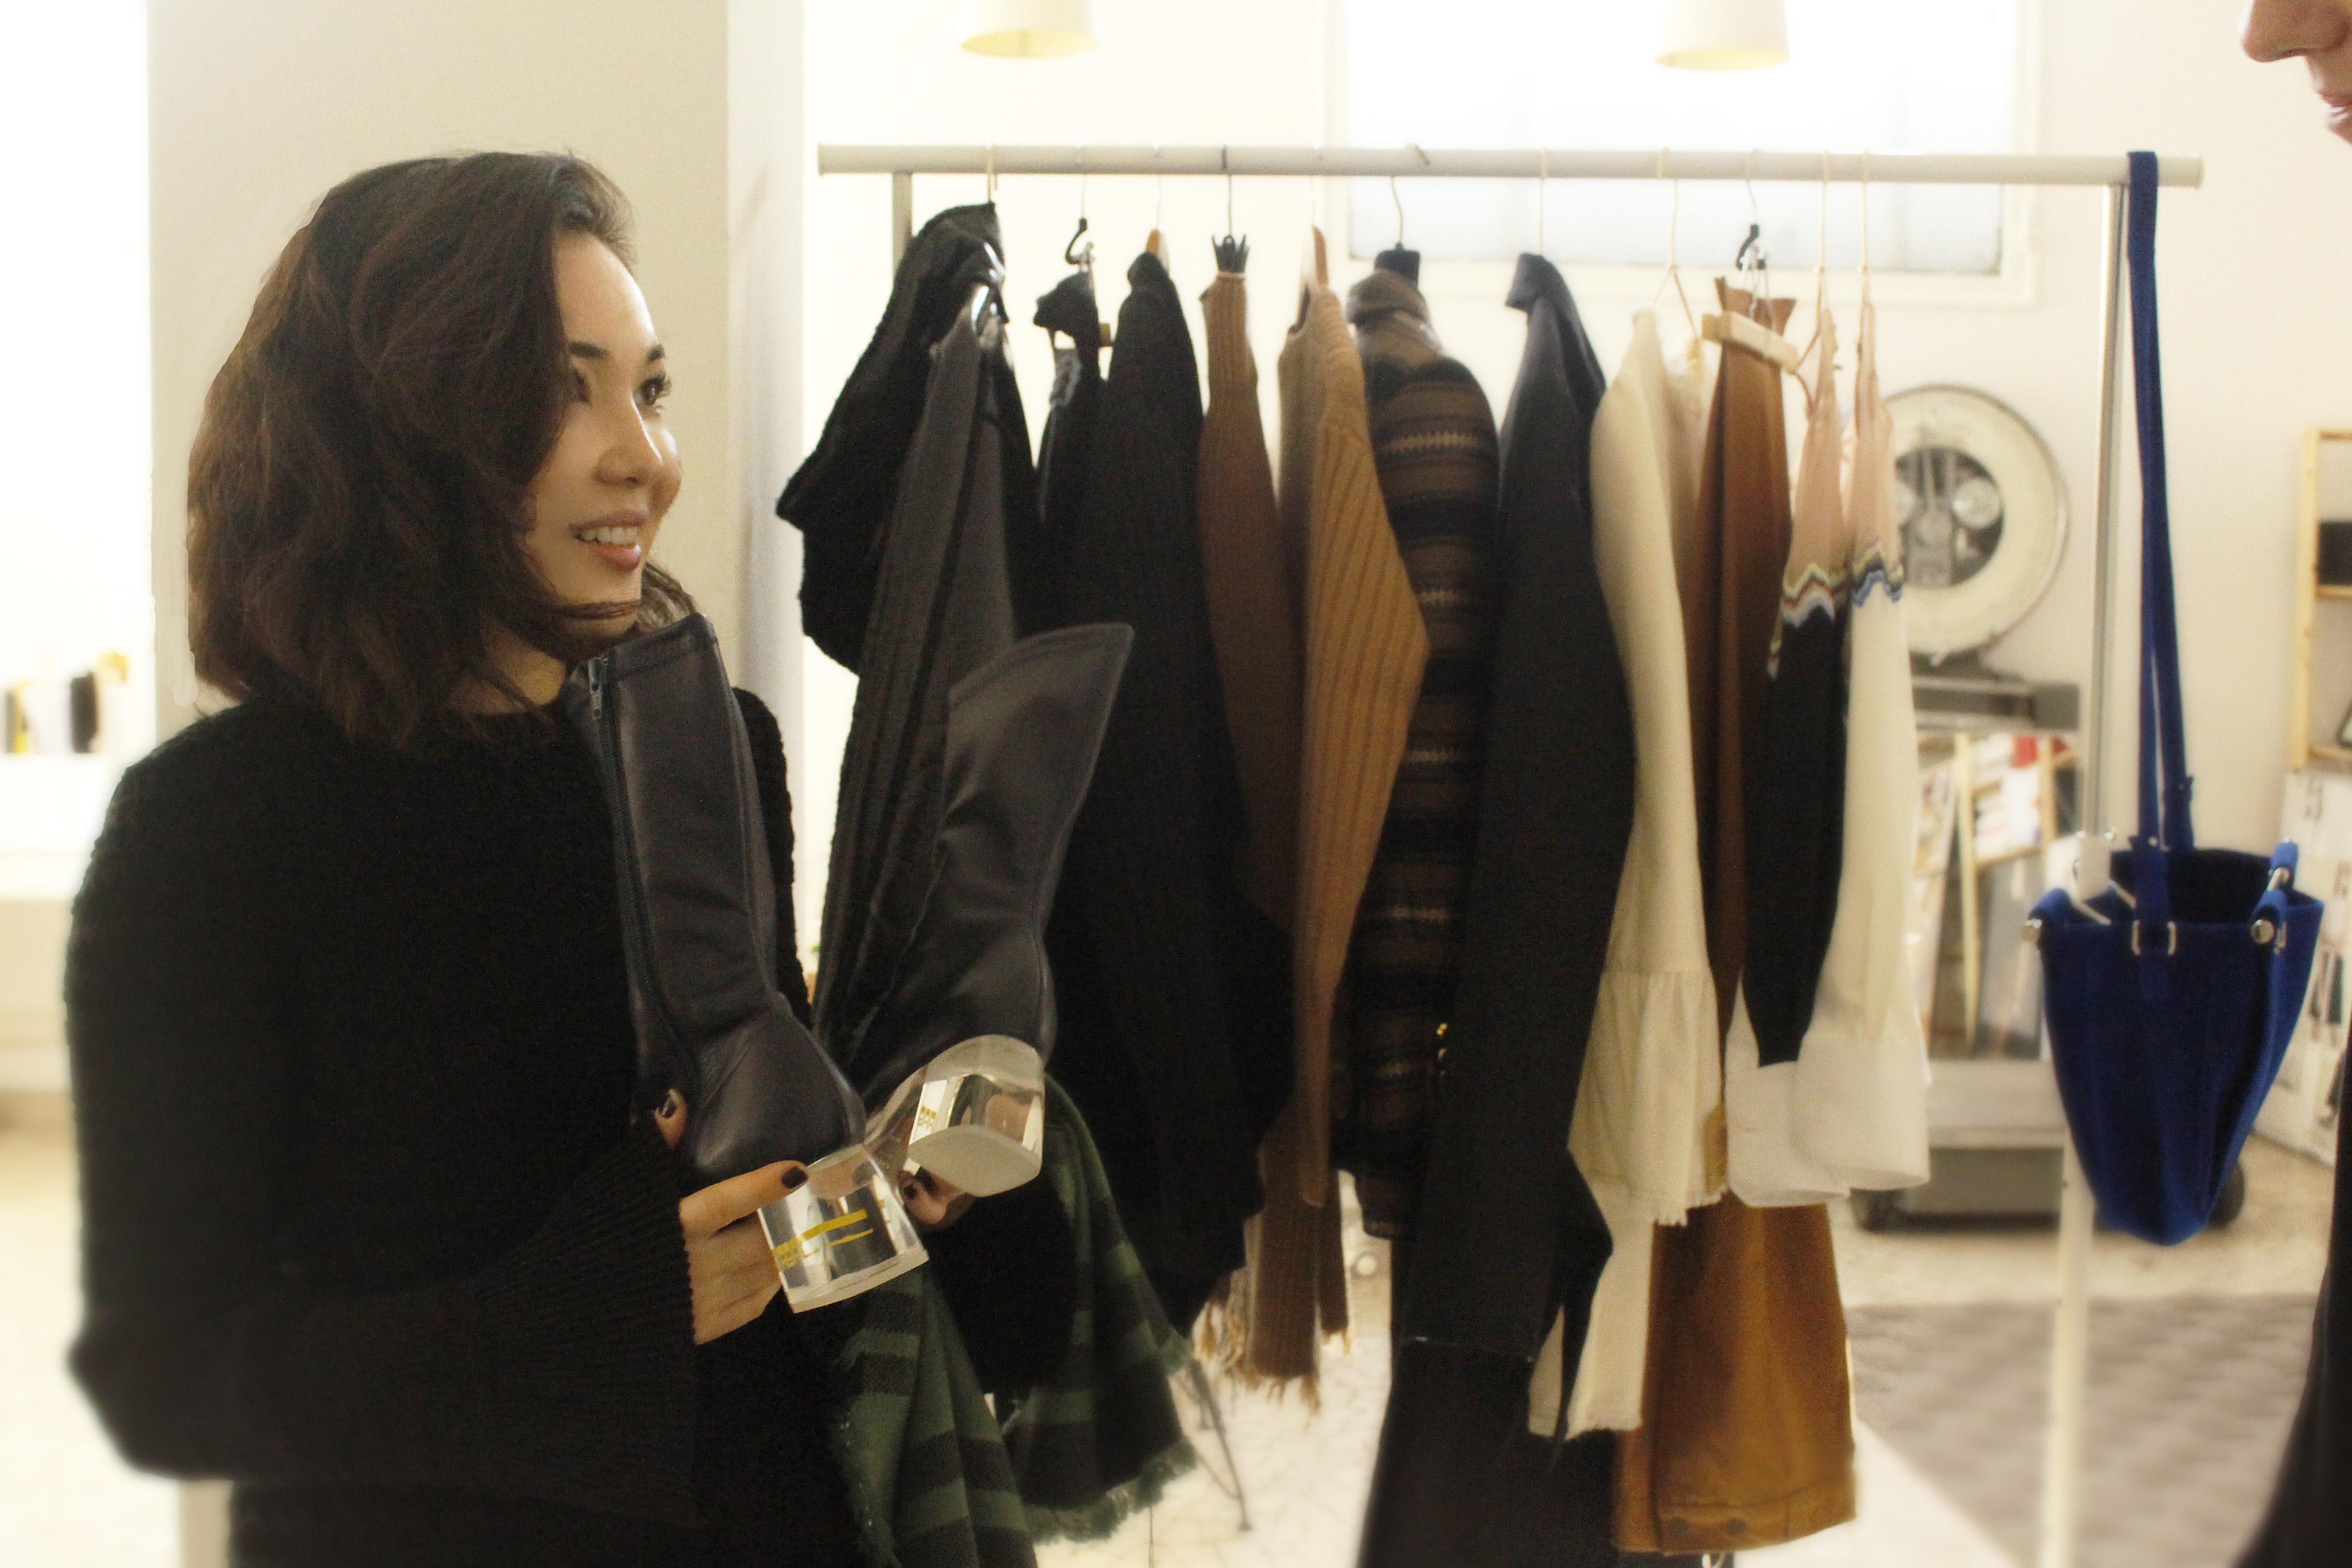 Aeré-store founder and owner Azhar Safinova. (photo: Paloma Montanaro)